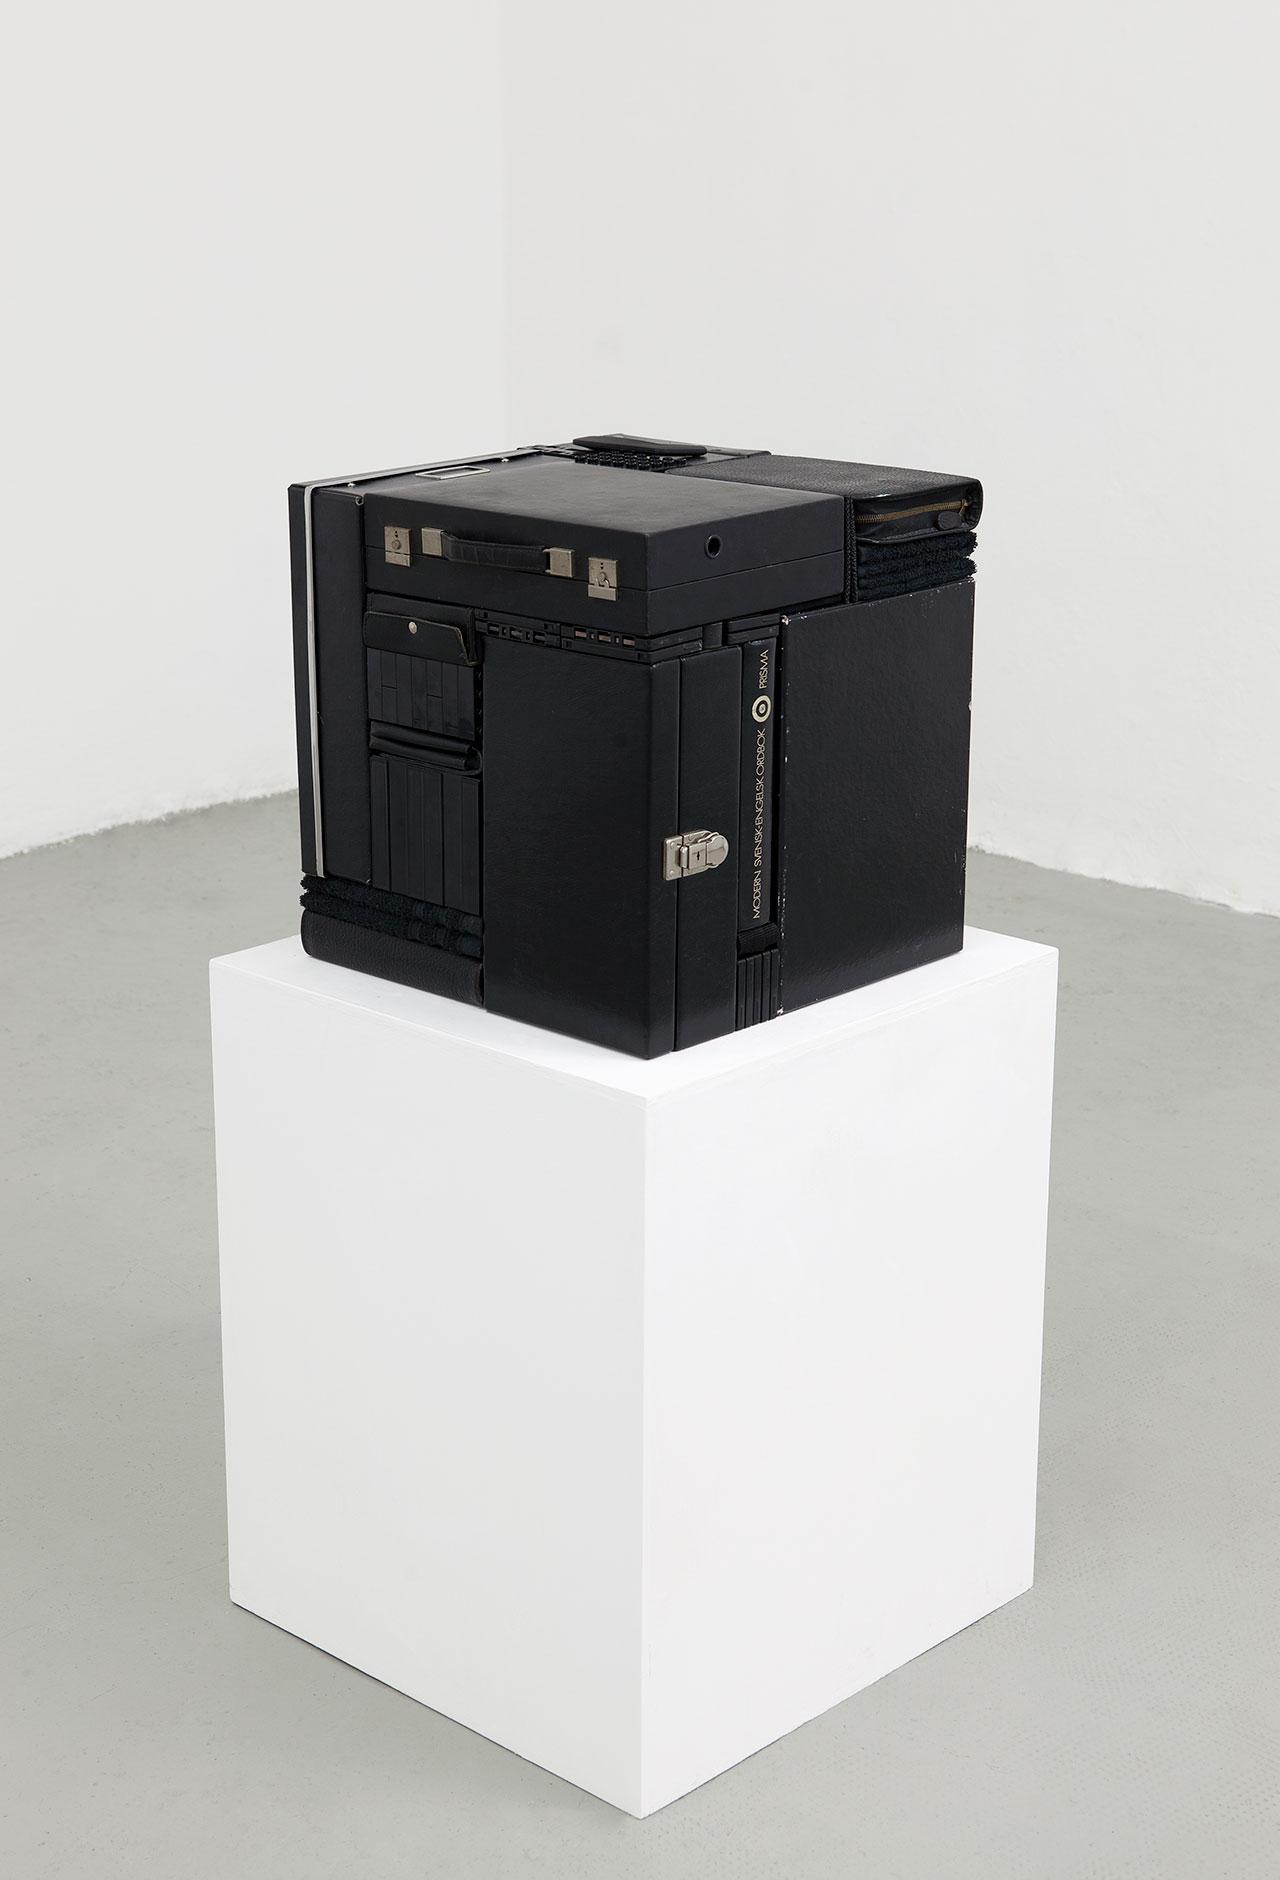 Michael Johansson, Déjà vu, 2018, black ordinary items, 45,5x44x42,5 cm. Courtesy: The Flat – Massimo Carasi, Milan. Photo © Michael Johansson.